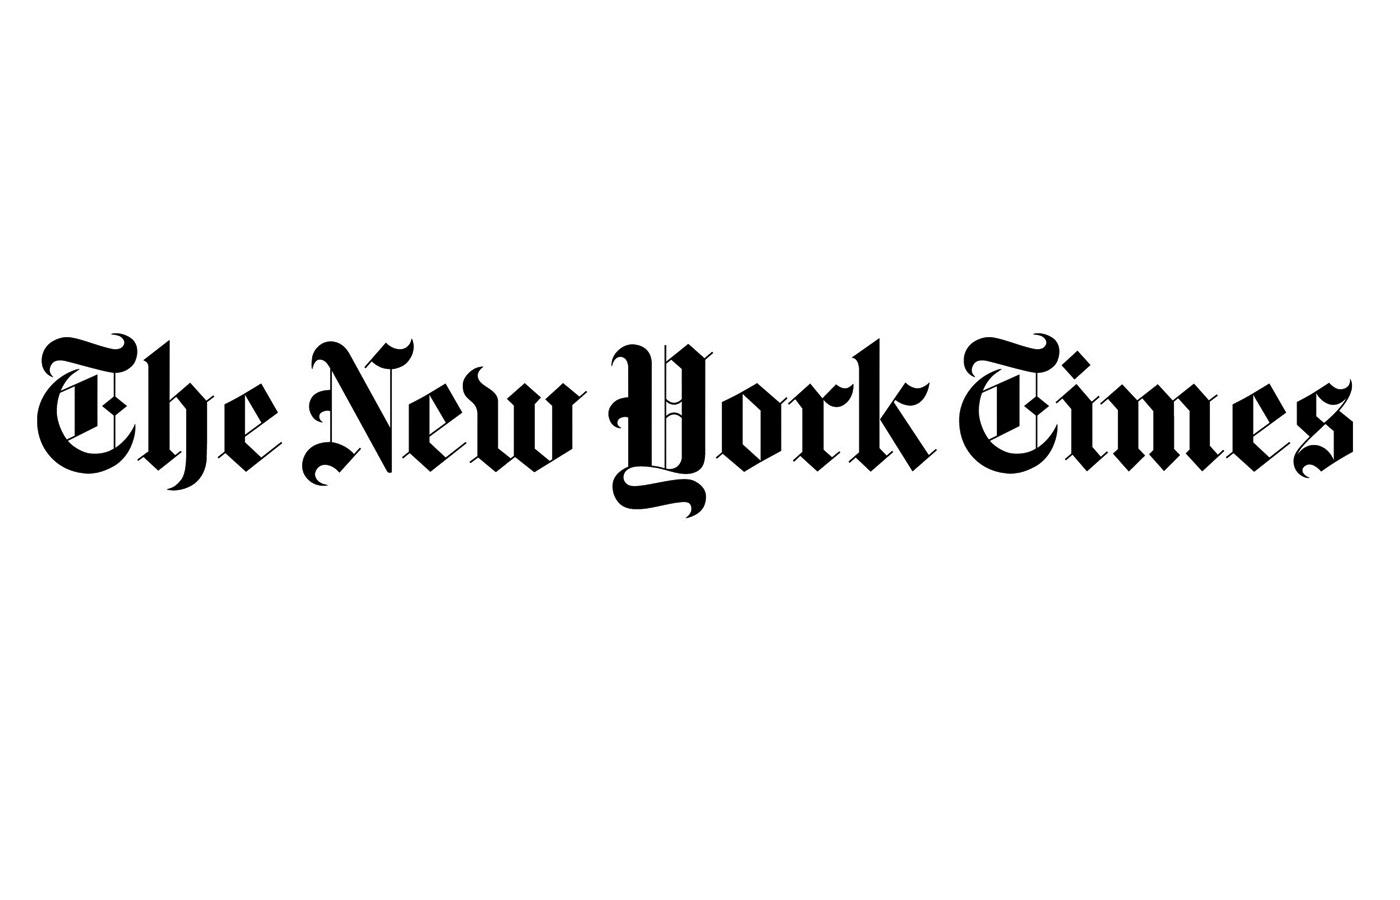 new-york-times-logo-8.jpg